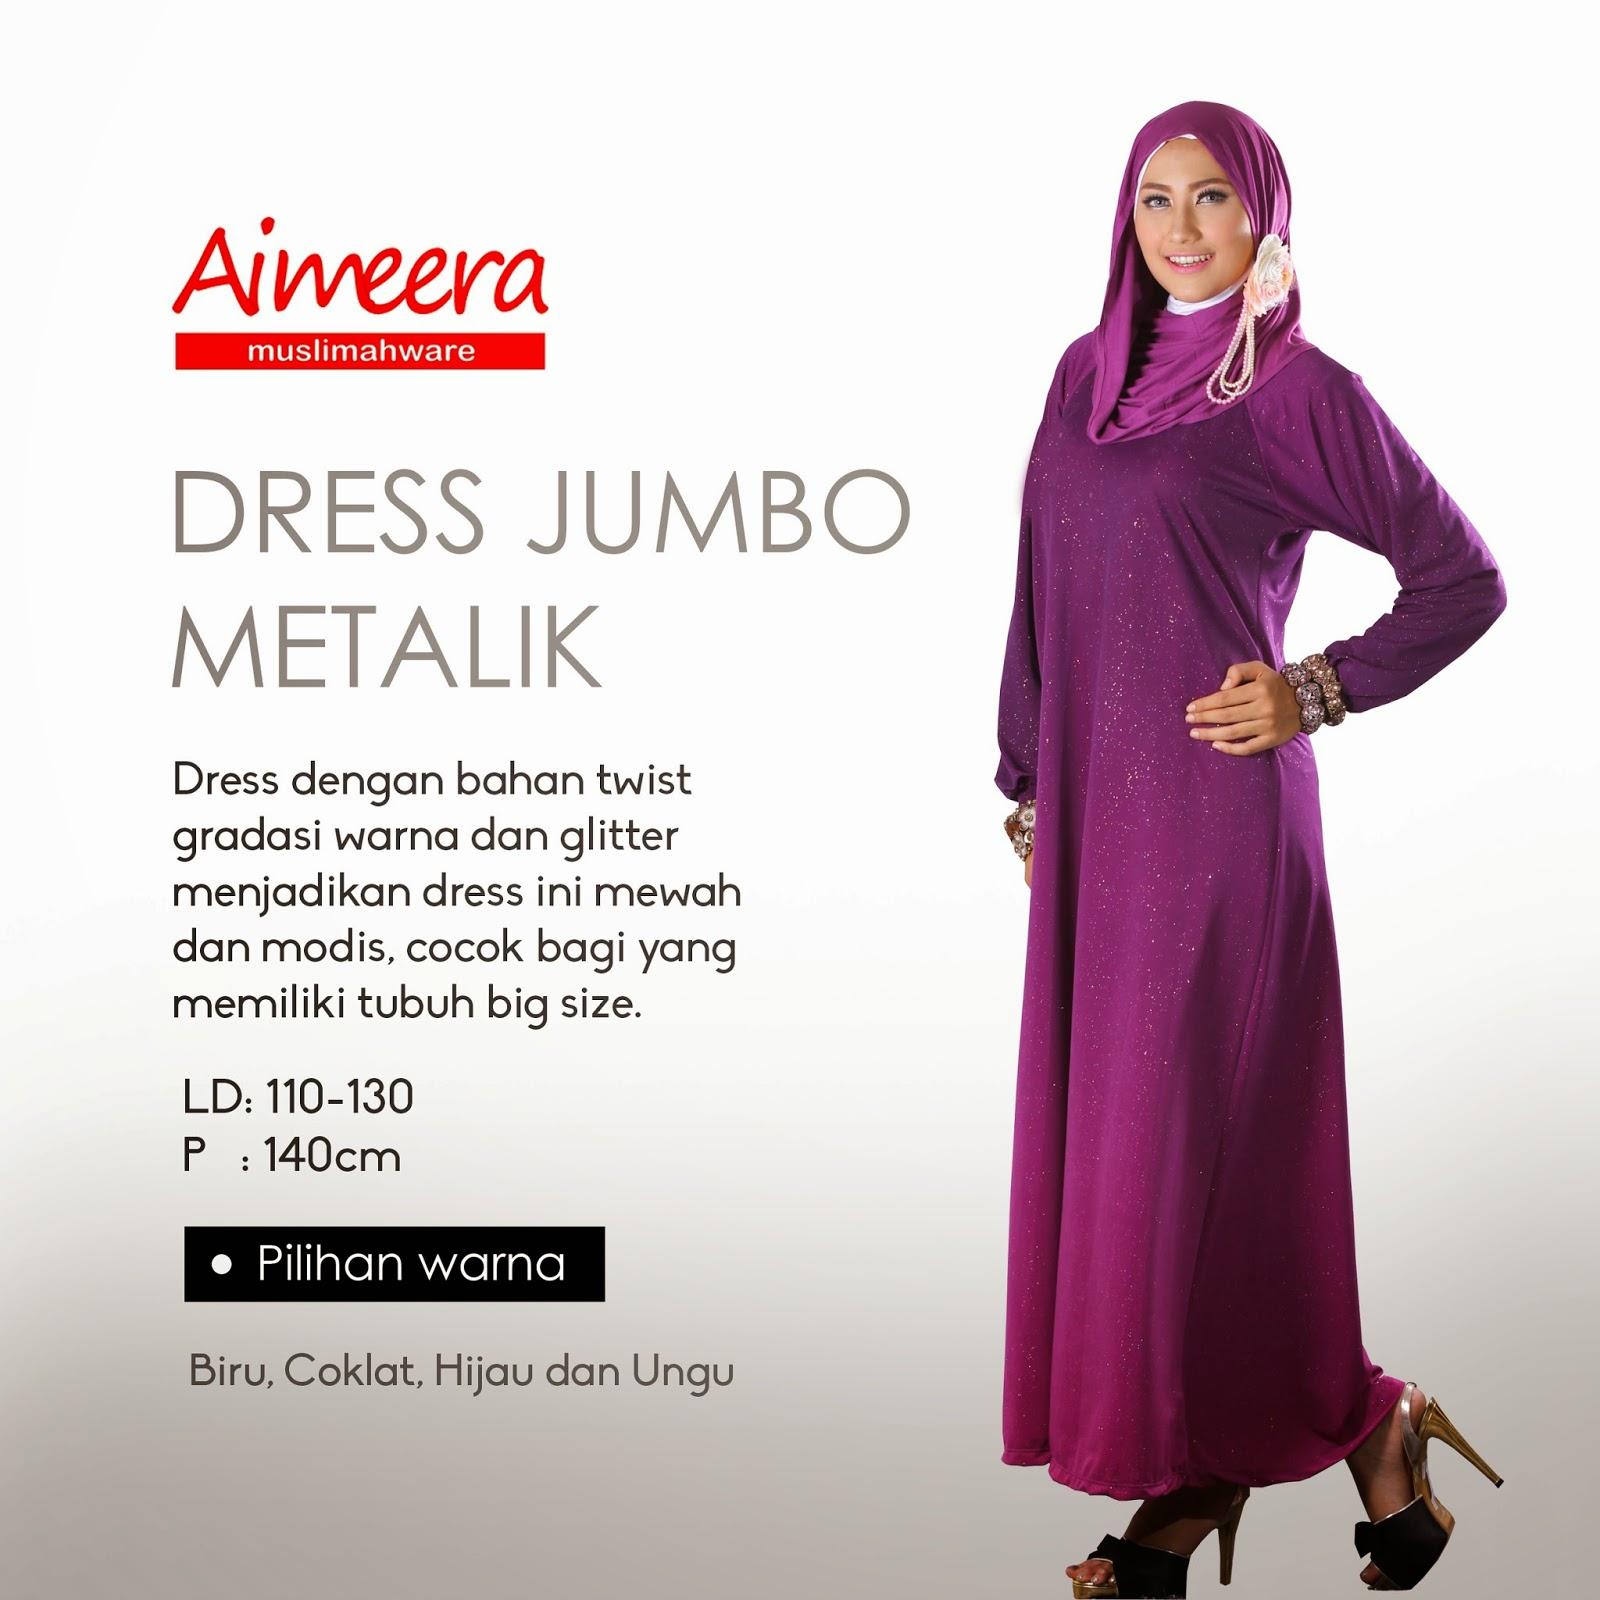 Dress Jumbo Metalik